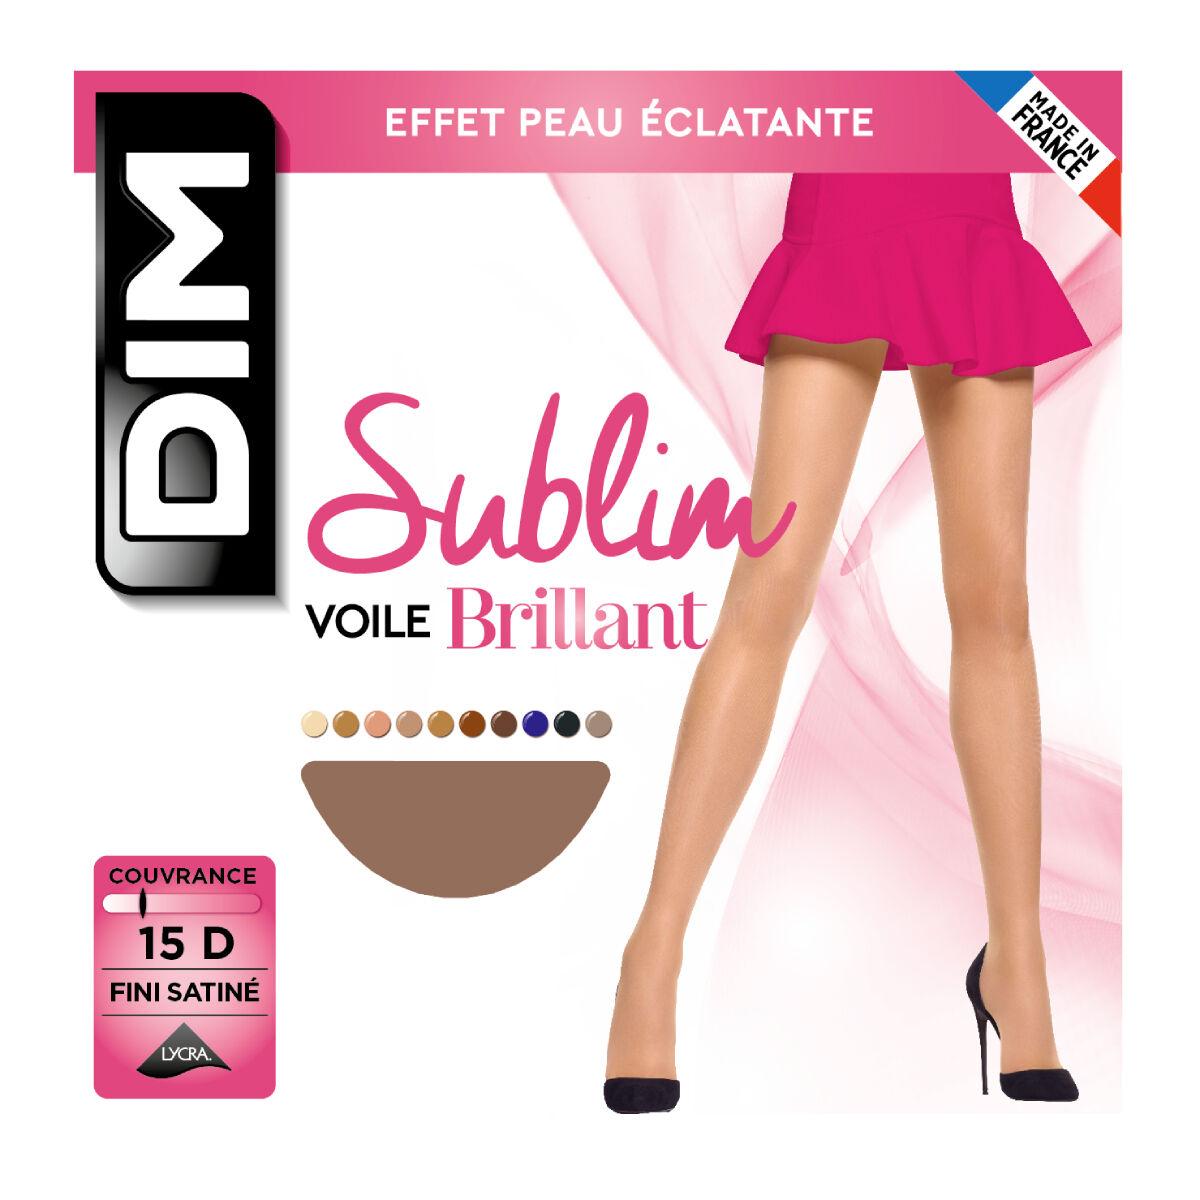 Sublim Voile Brillant 15 sheer shine tights in gazelle